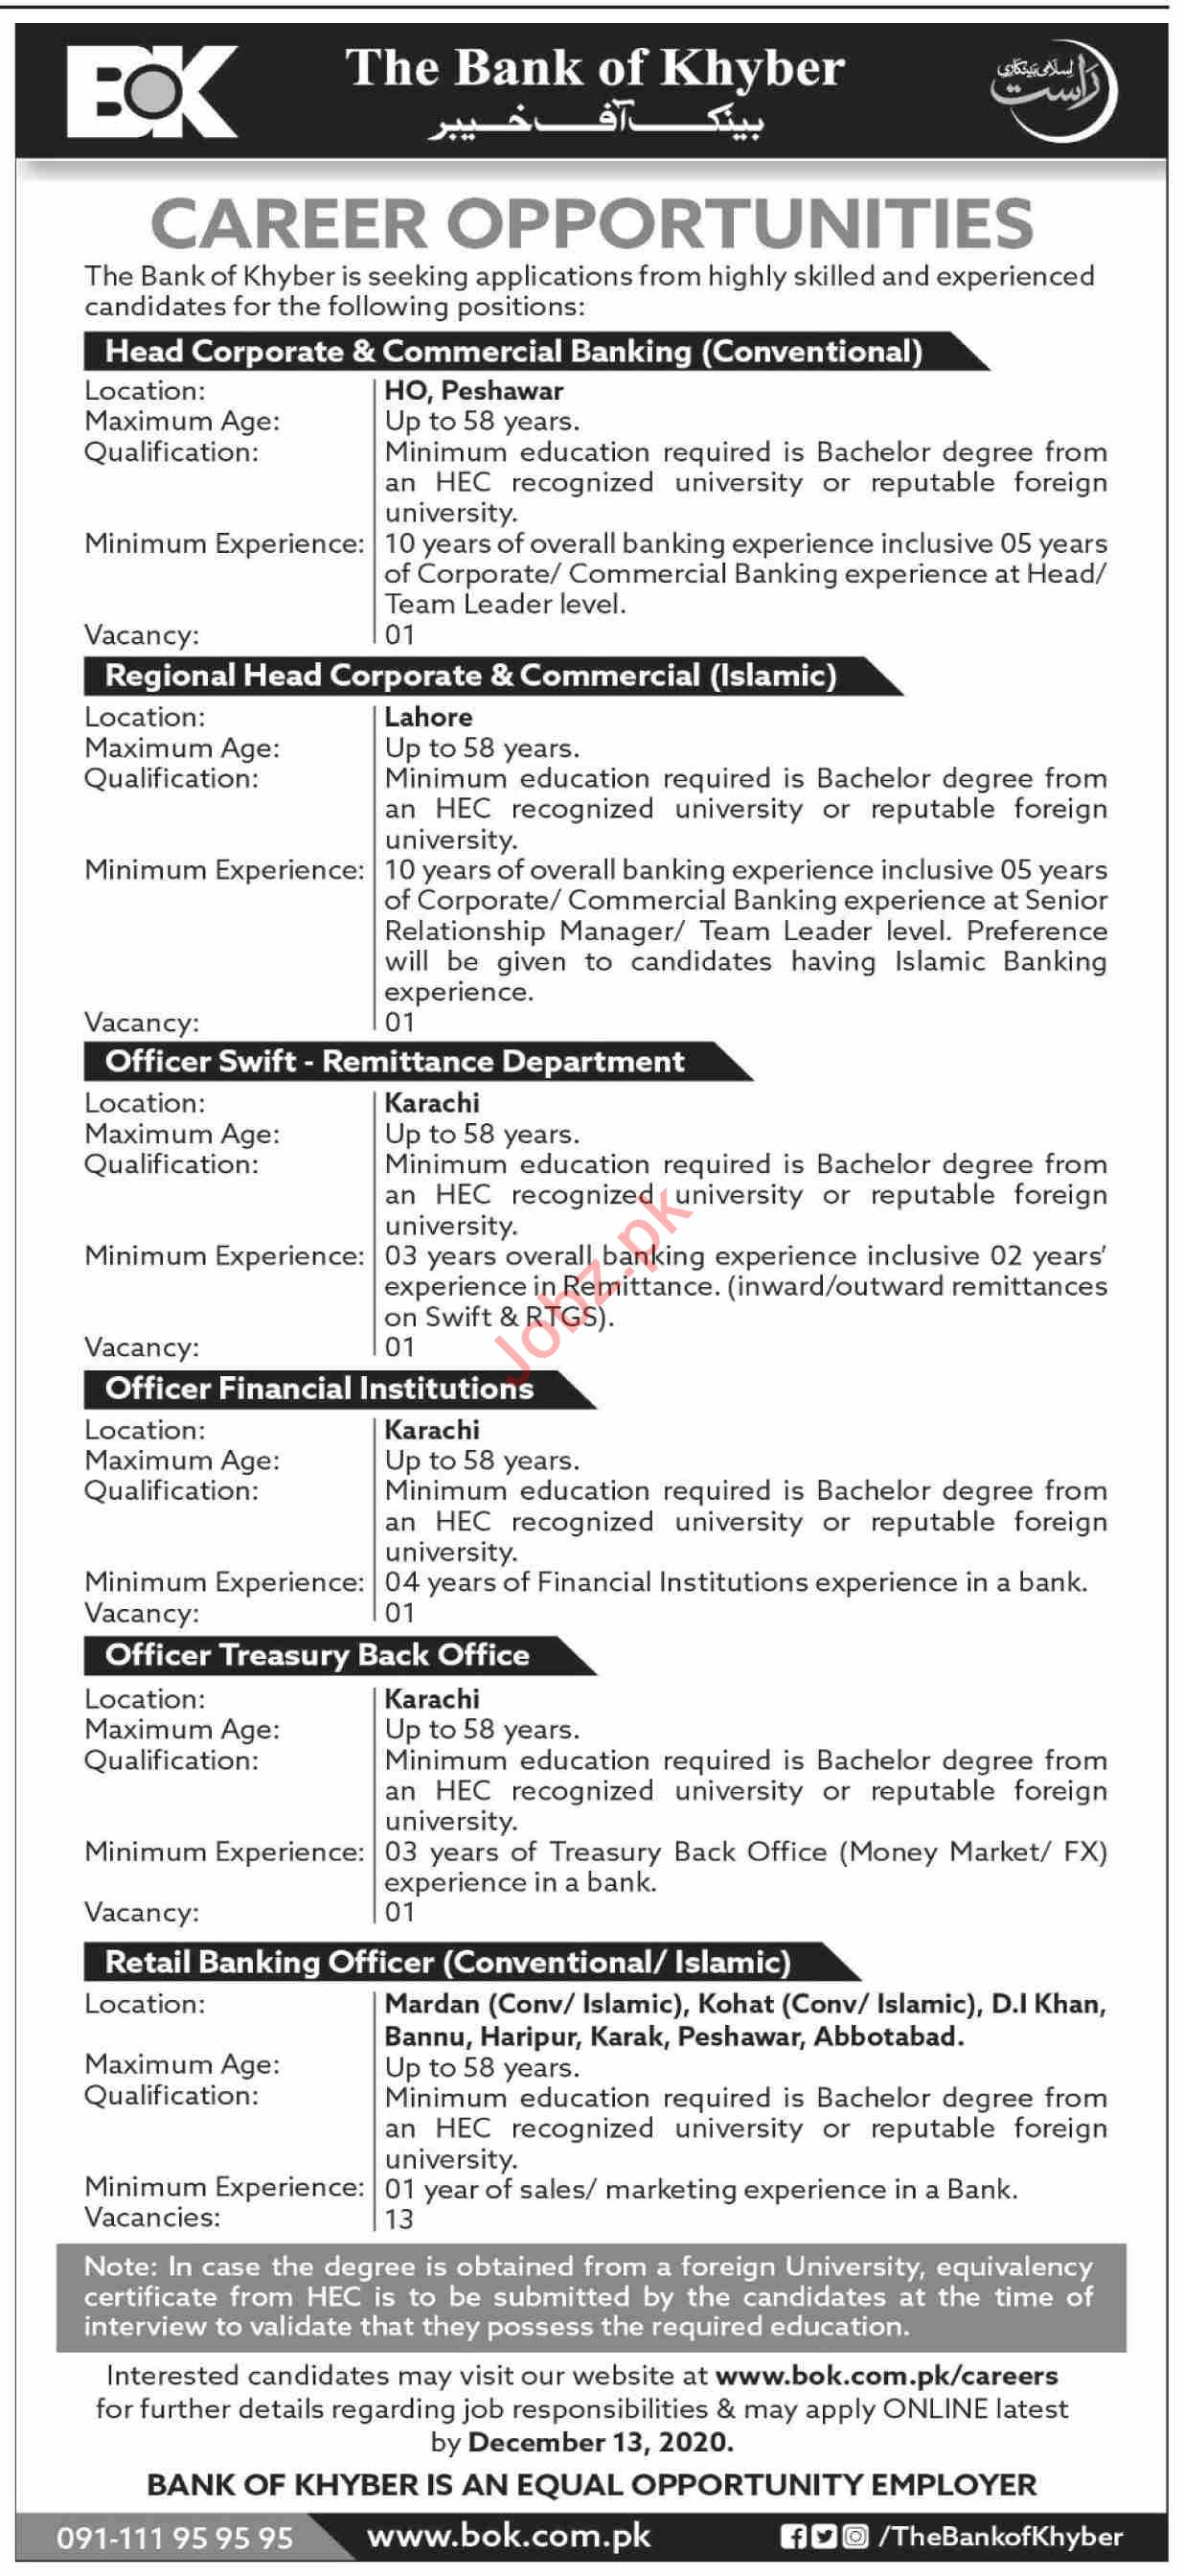 The Bank of Khyber BOK Jobs 2020 for Office Swift